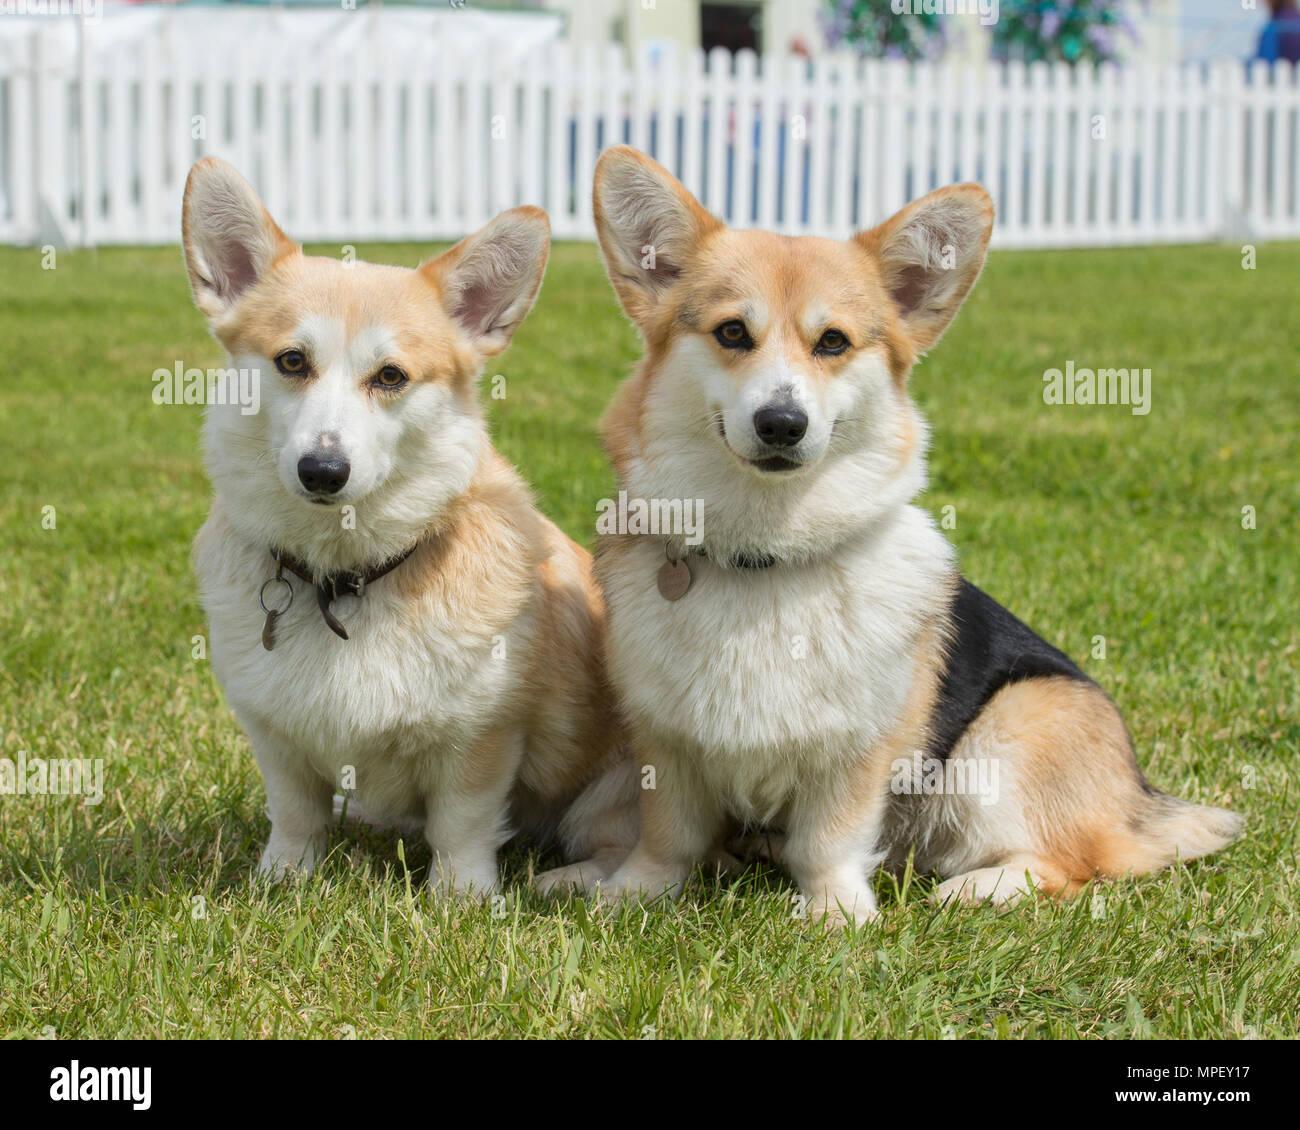 two Pembroke corgi dogs - Stock Image